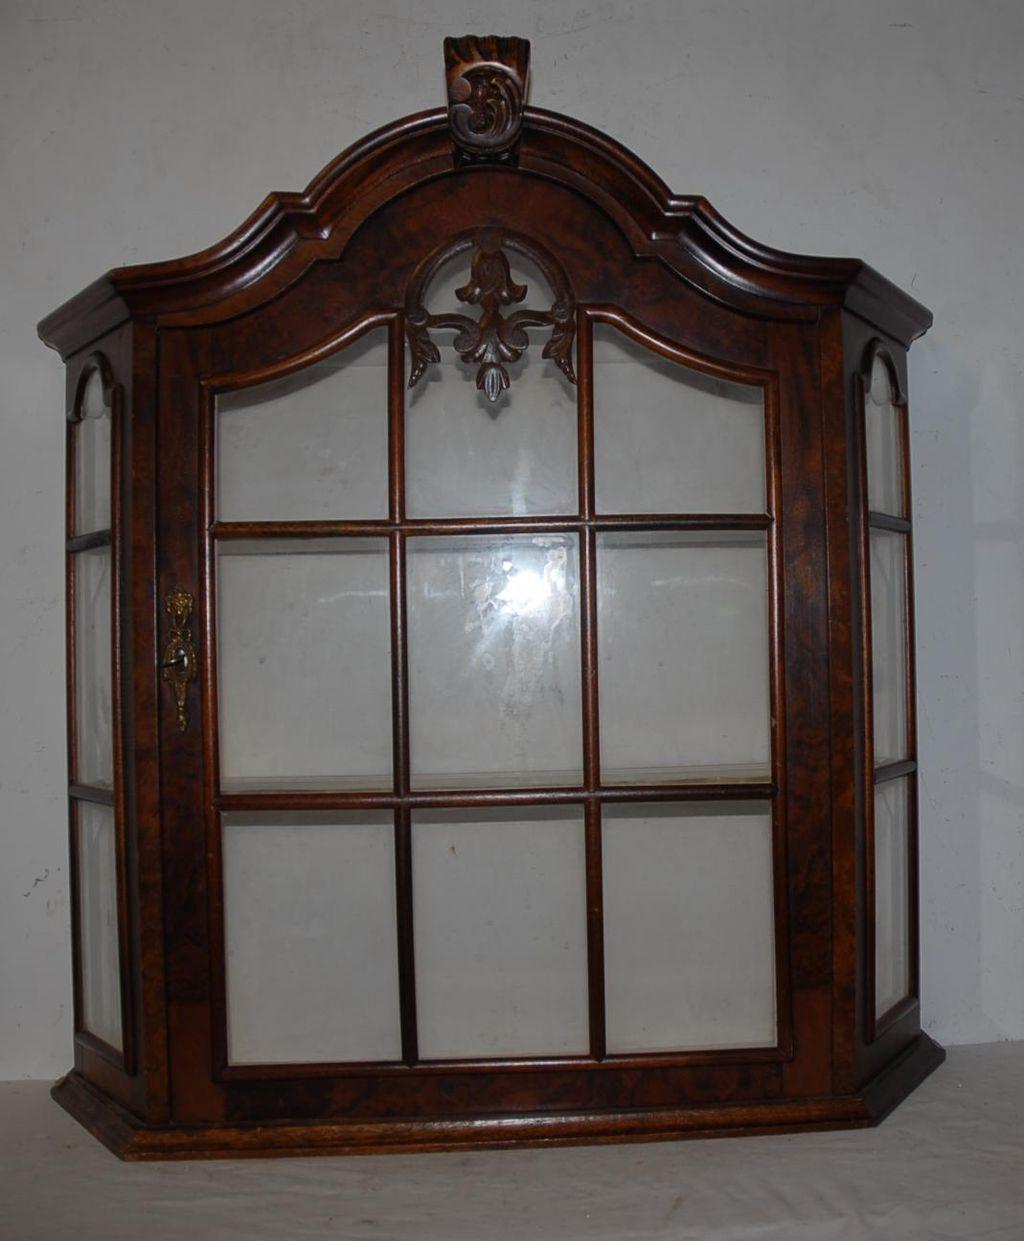 Vintage Quality Wooden & Glass Display Vitrine Wall Hanging 1-door ...